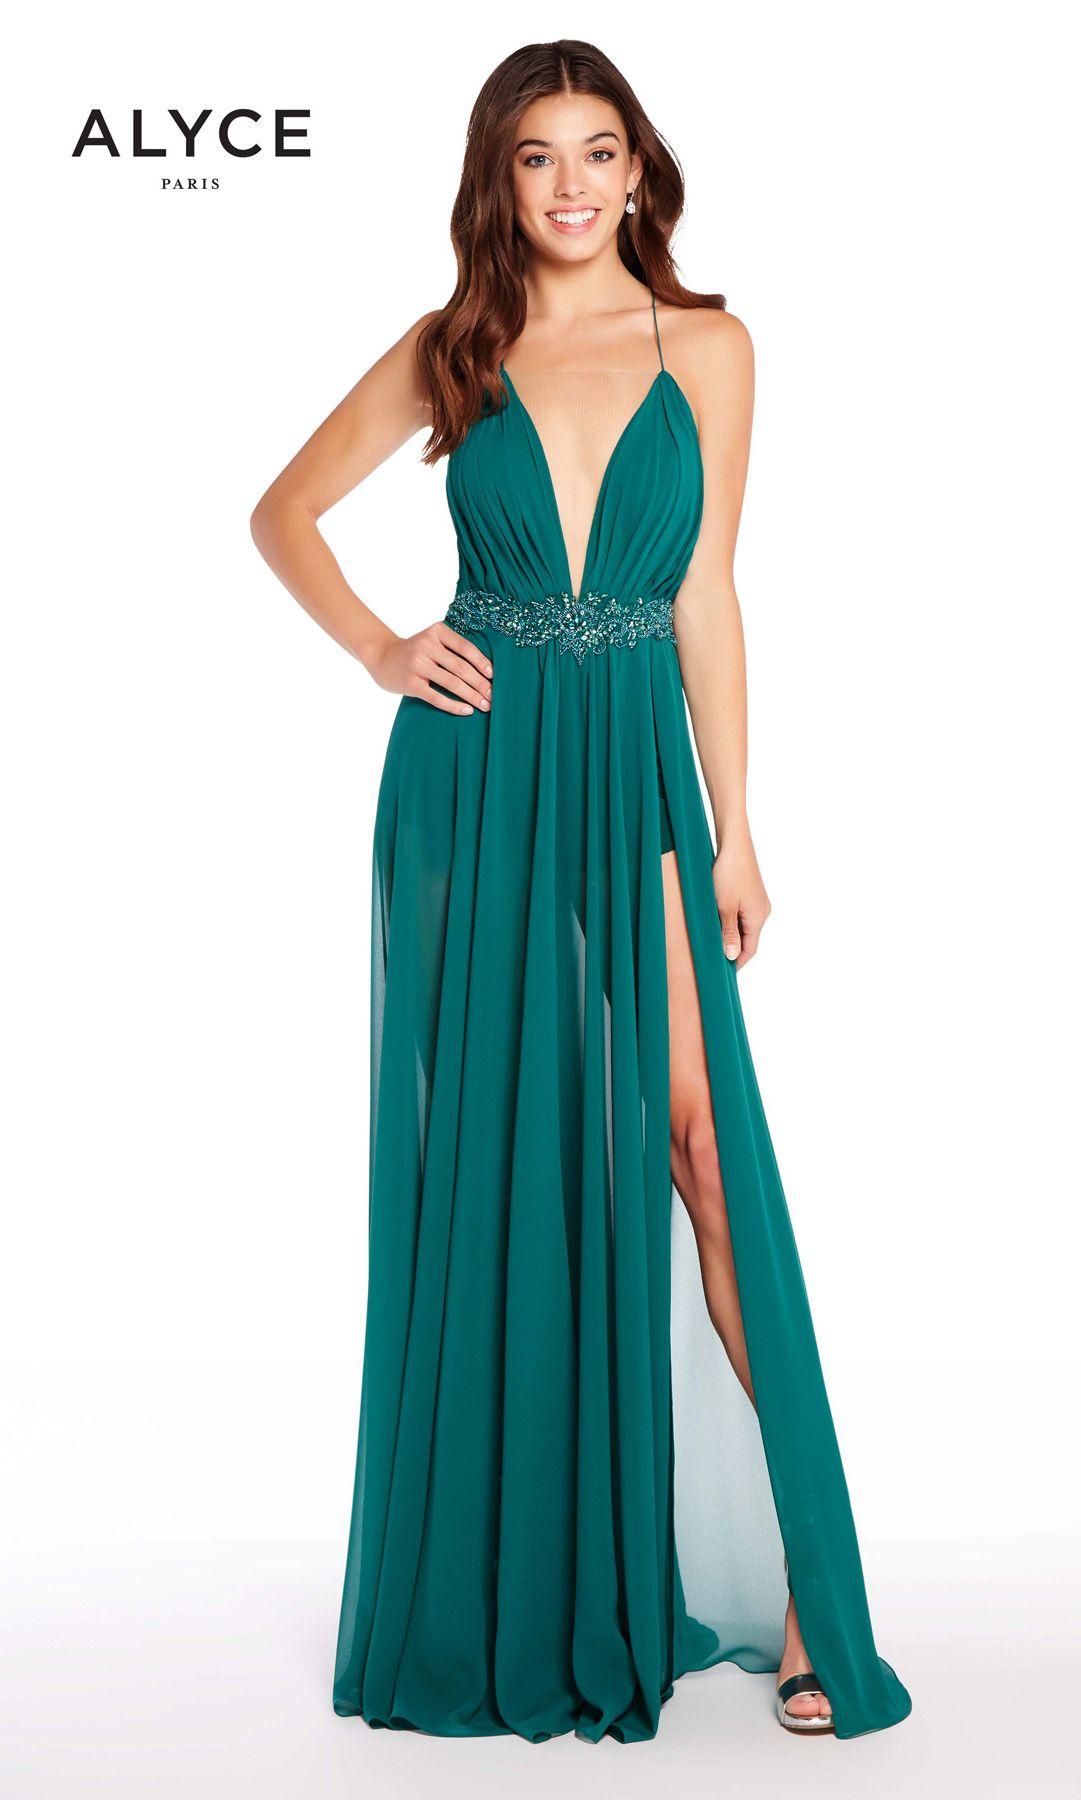 Alyce Paris 60093 - International Prom Association Dresses ...